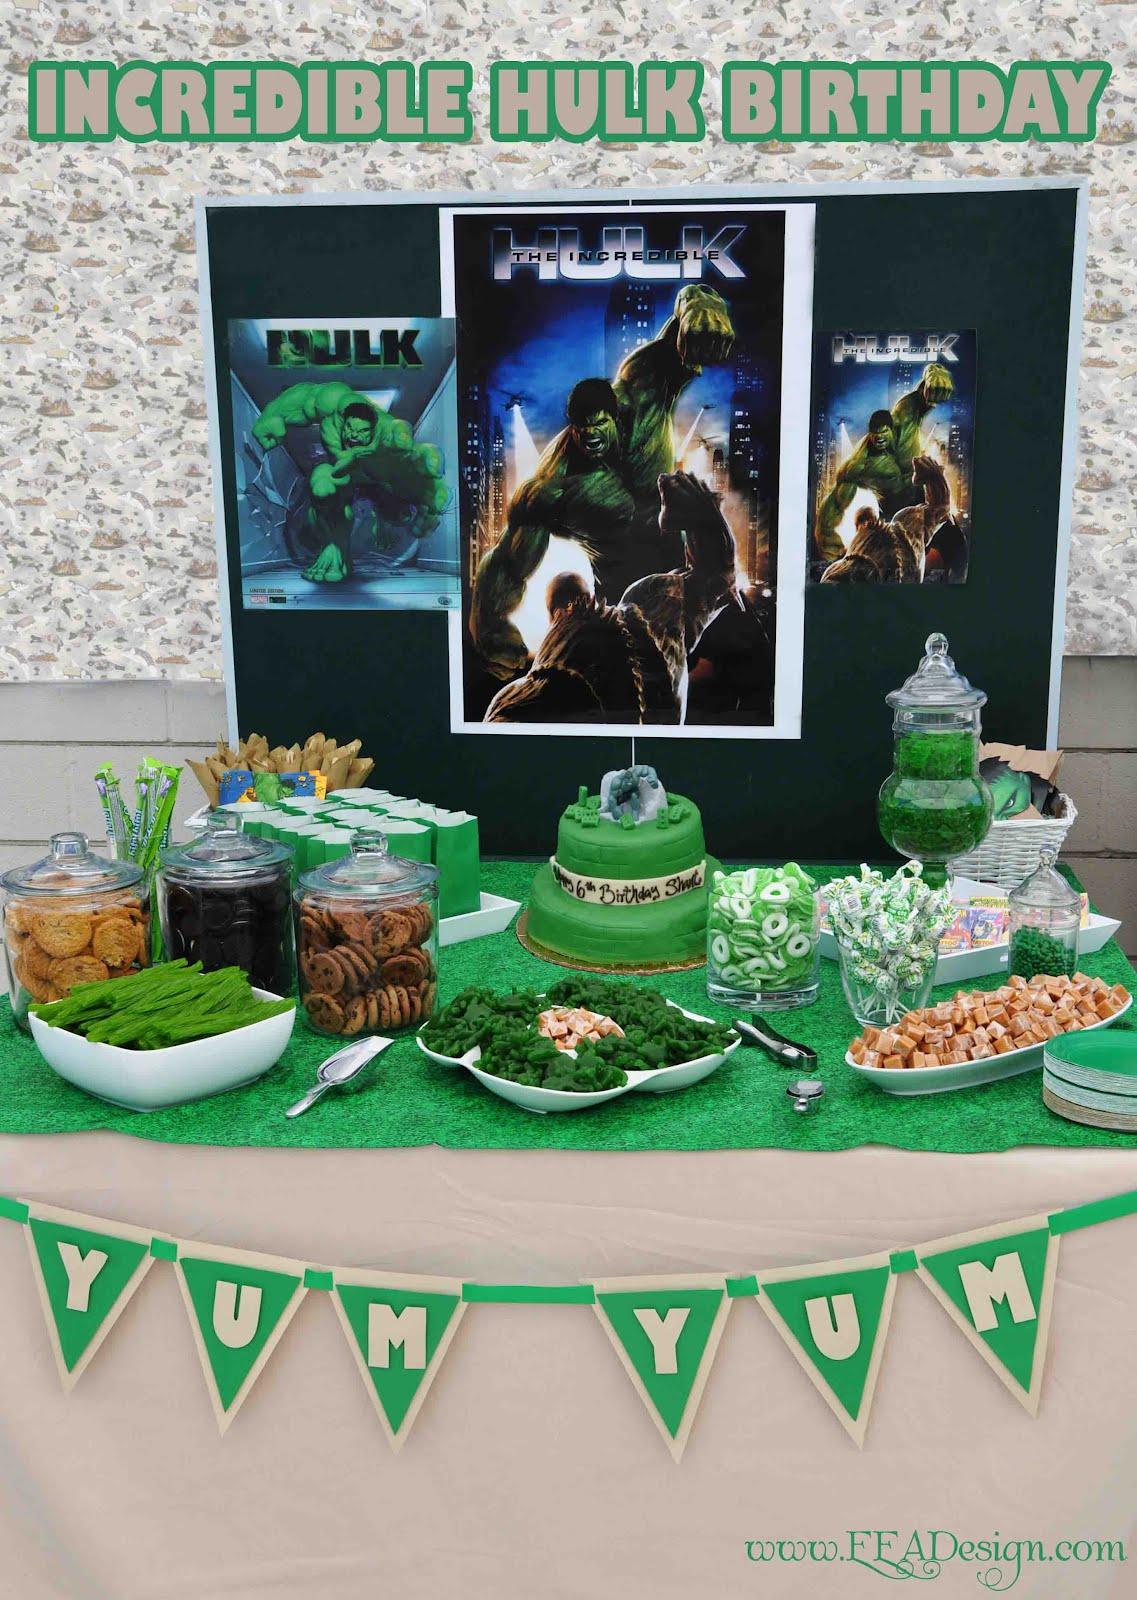 Fiesta tem tica de hulk fiestas infantiles directorio - Adornos de fiesta ...